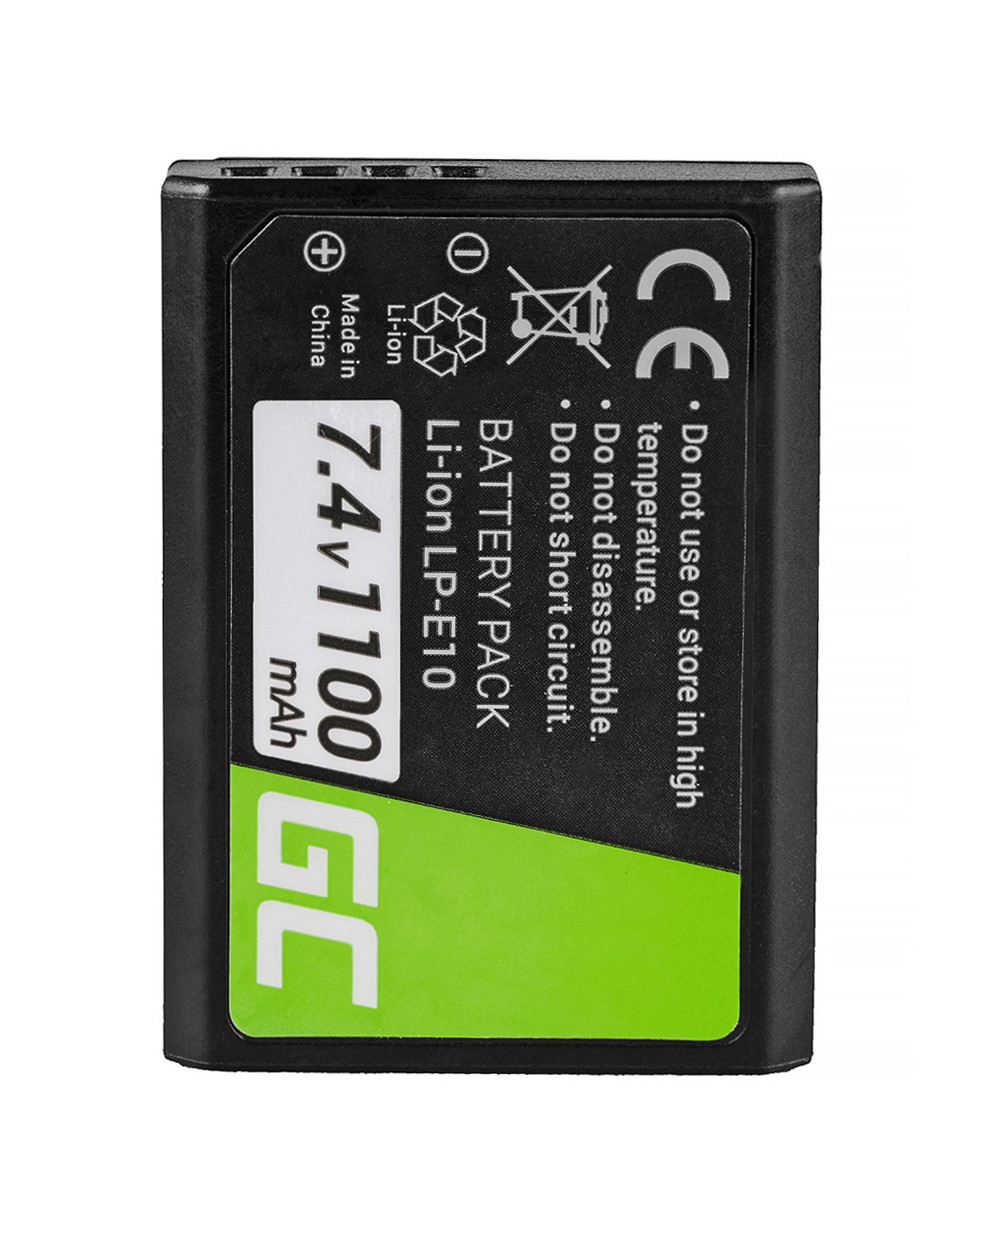 Green Cell Battery LP-E10 Canon EOS Rebel T3, T5, T6, Kiss X50, Kiss X70, EOS 1100D, 1200D, 1300D 7.4V 1100mAh